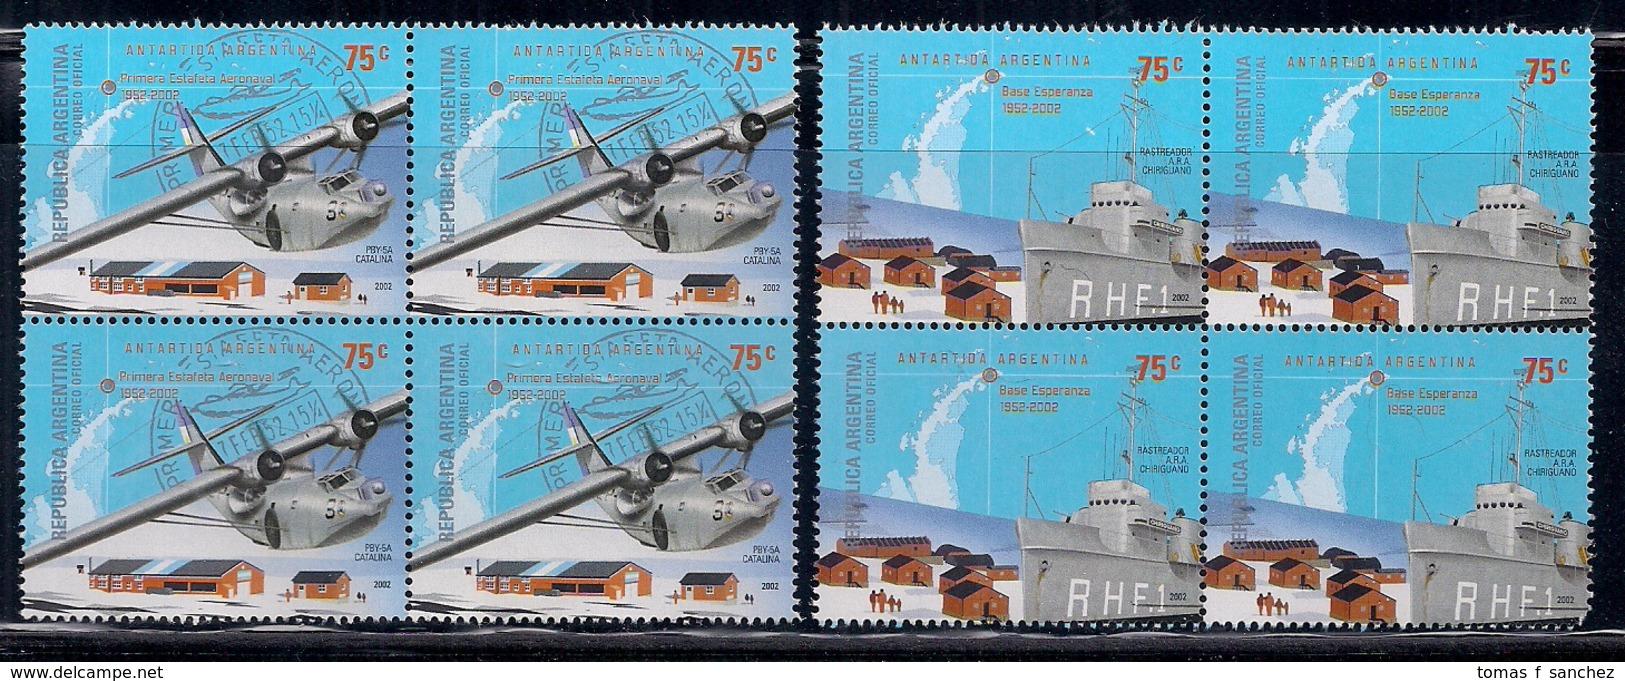 Argentina - 2002 - Antarctique Argentine - Base Esperanza - Premier Aéronef Estafeta En Antarctique. - Argentina